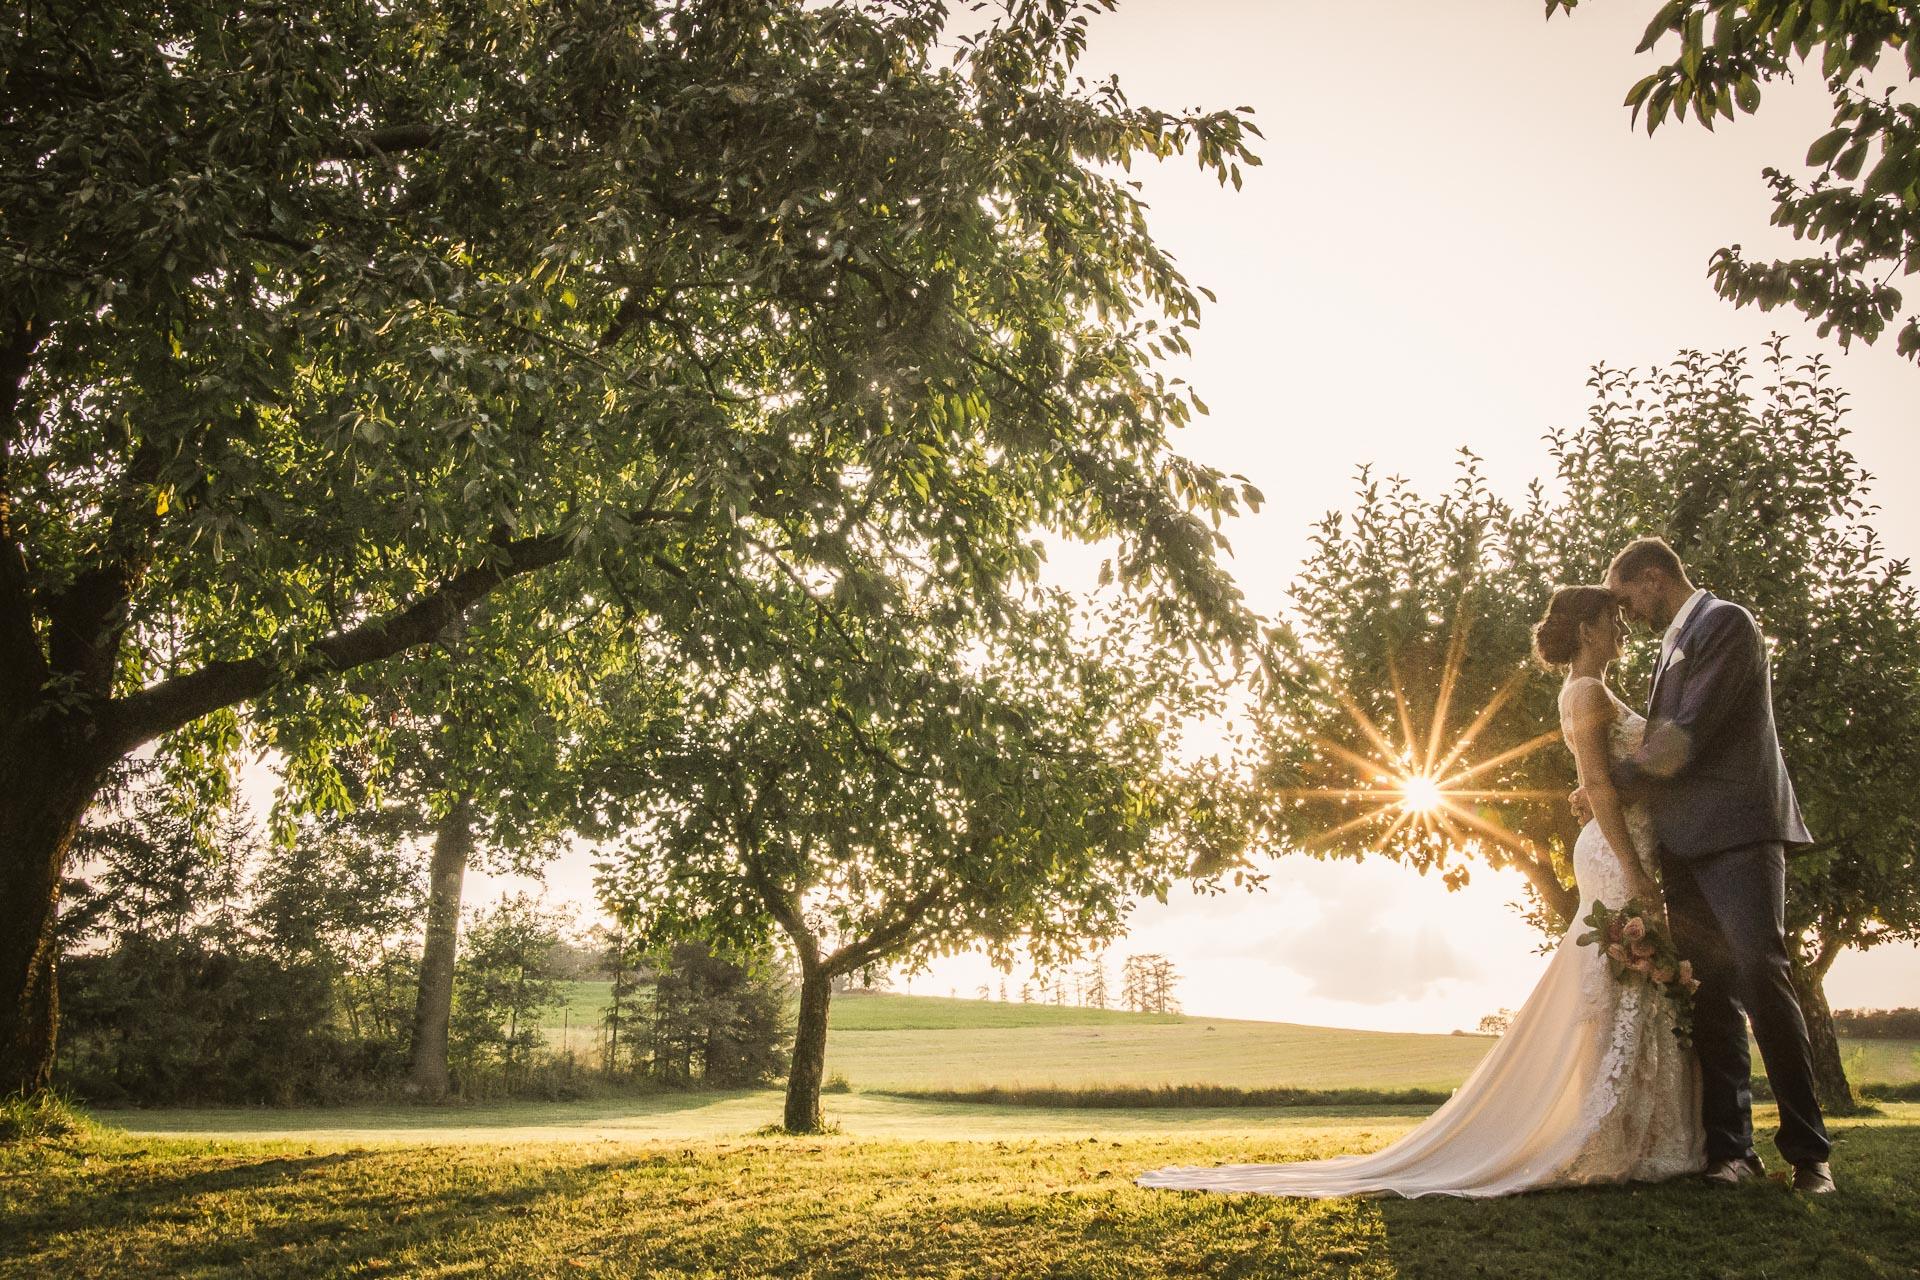 svatební-fotograf-wedding-svatebni-video-orlík-vltava-kostel-statek-stodola-boho-svatba-Beautyfoto-549